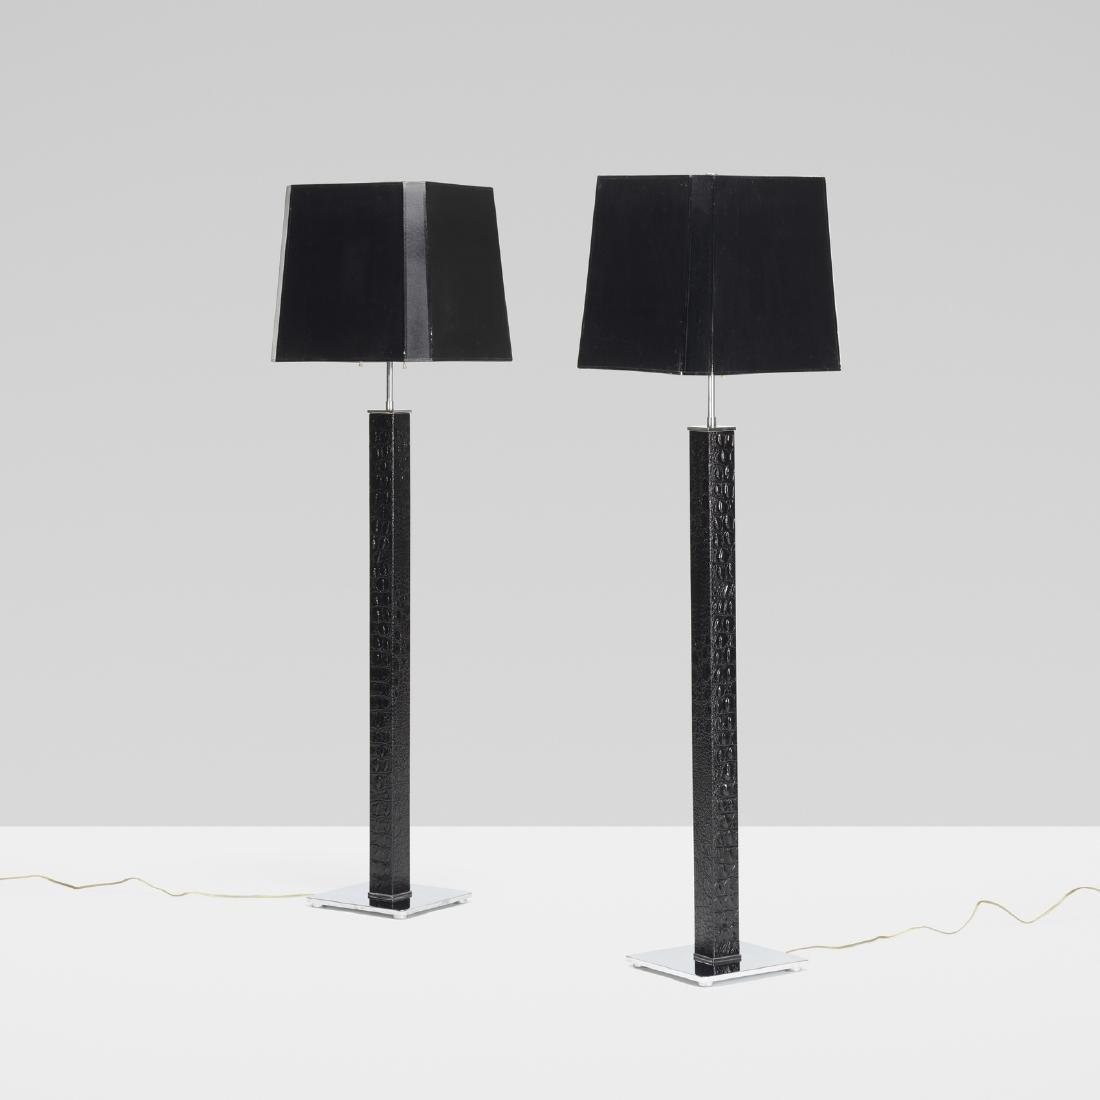 Karl Springer, Square Column floor lamps, pair